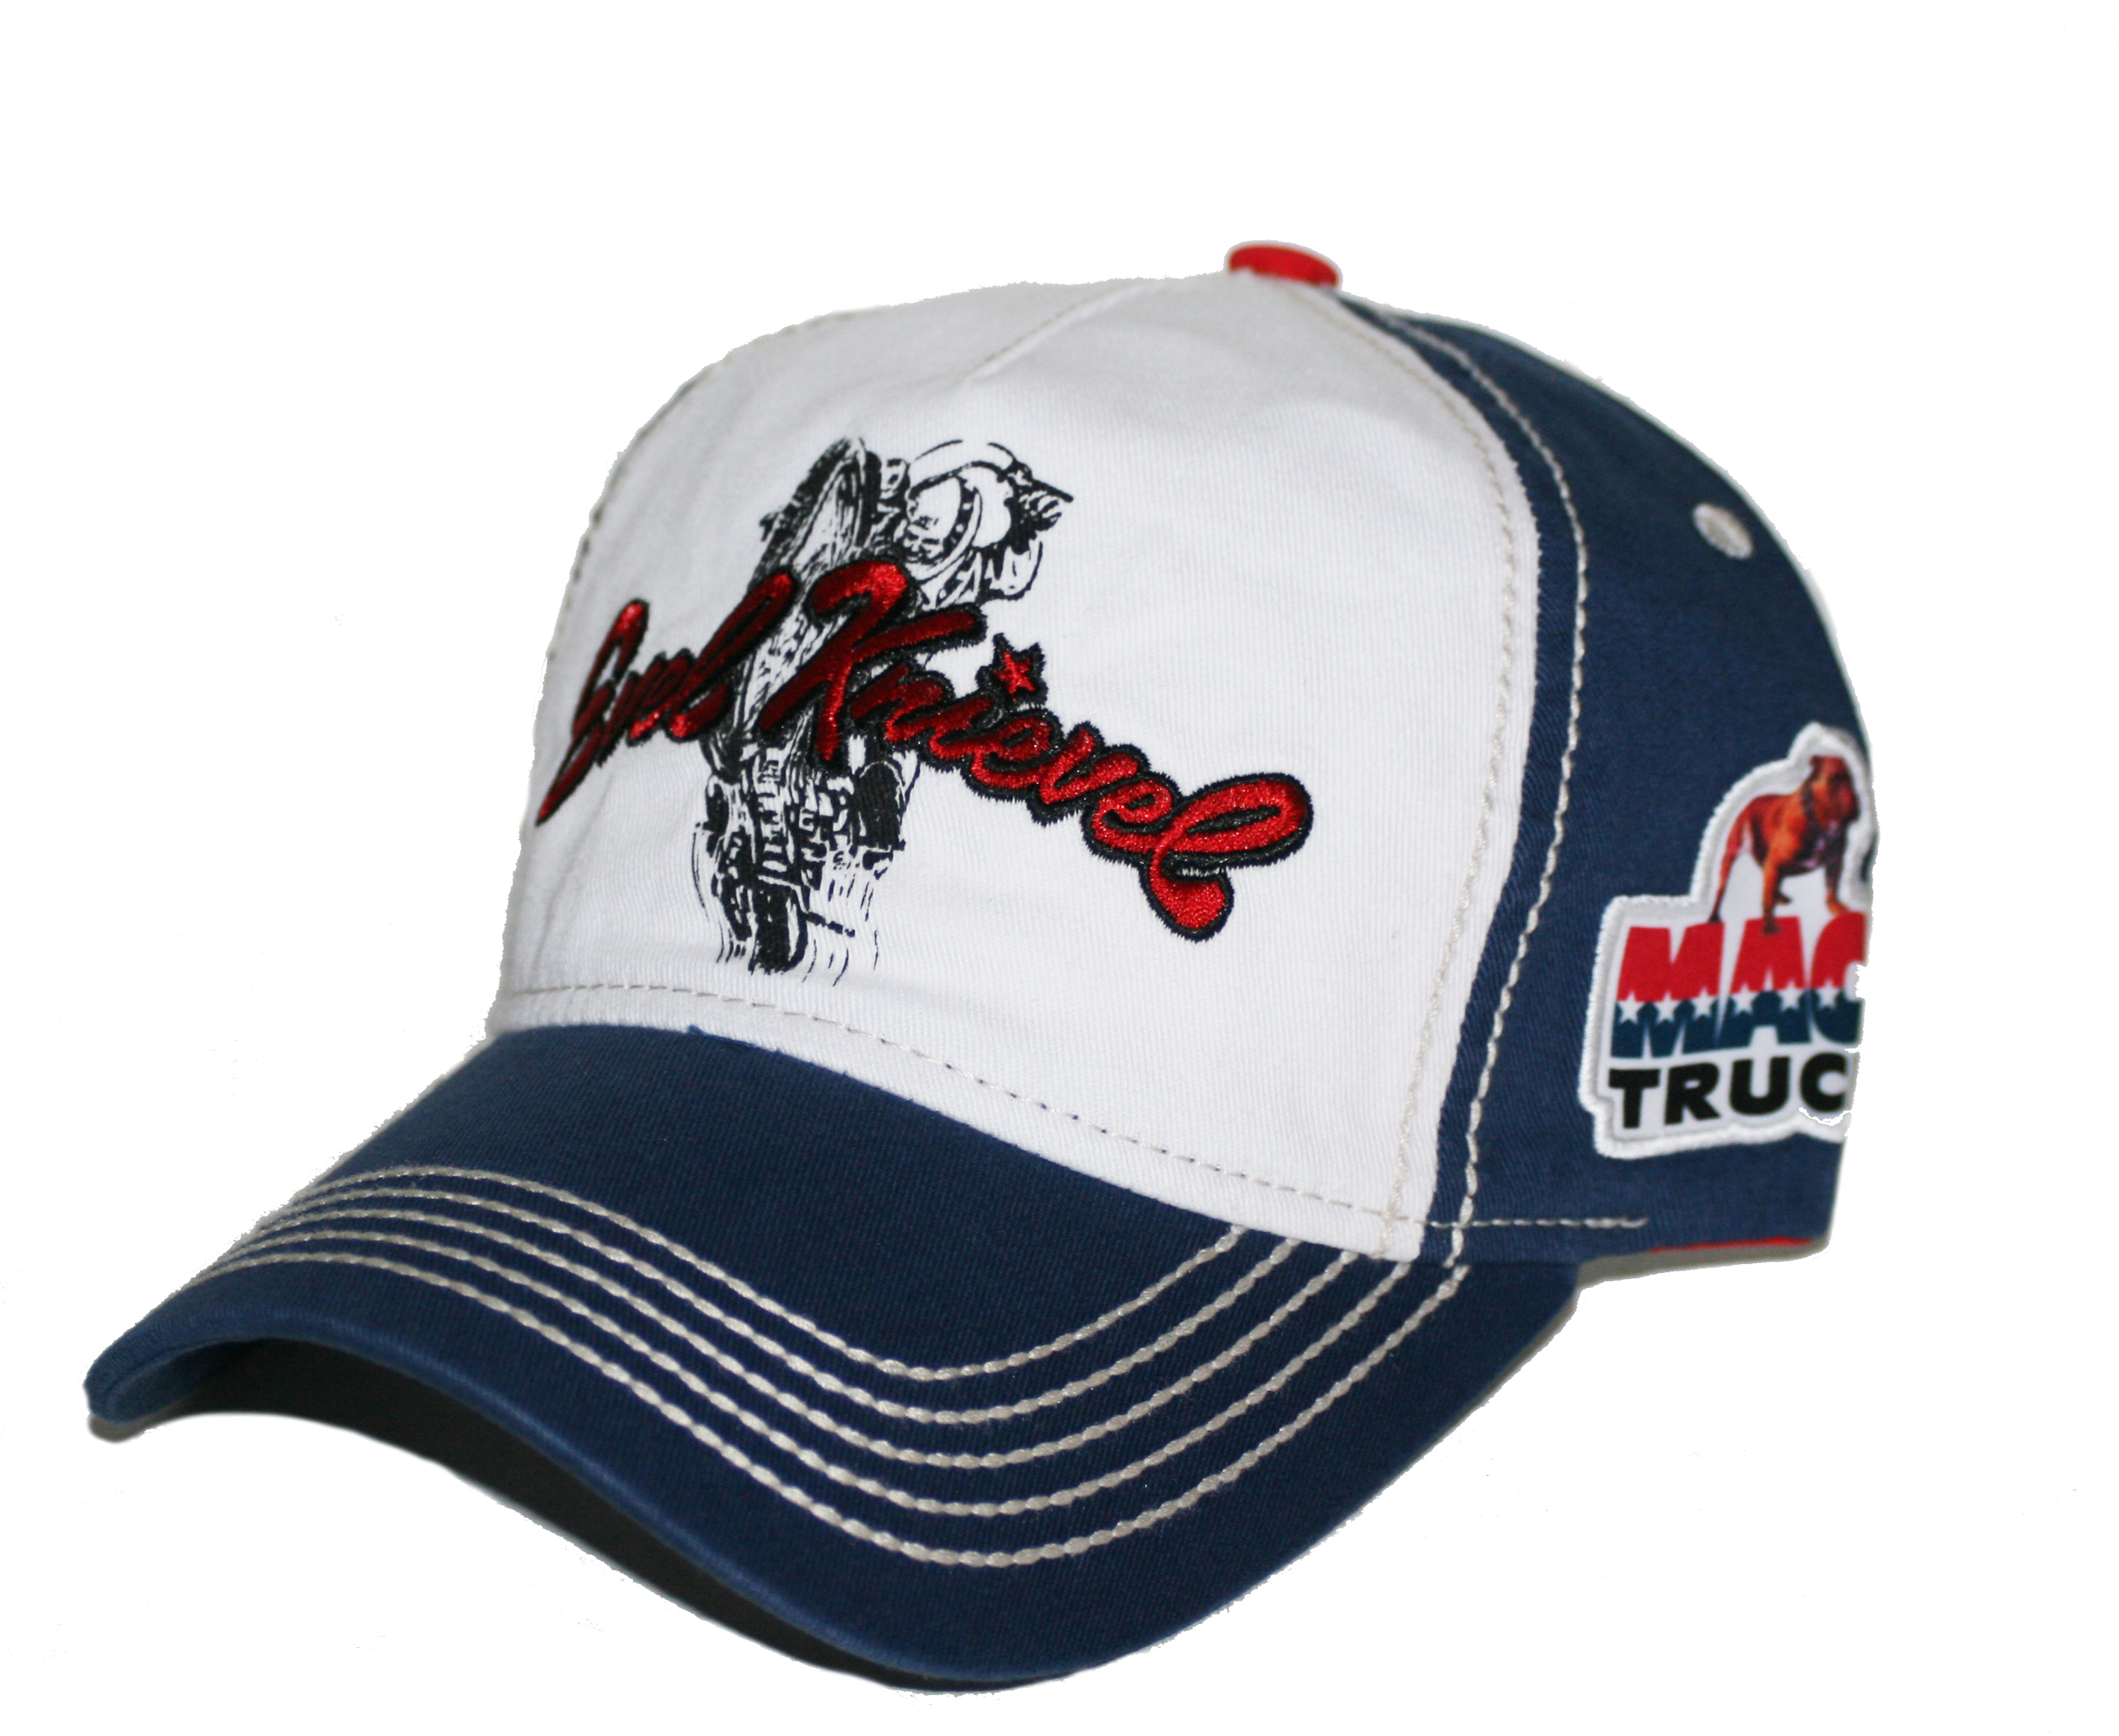 Mack Truck Merchandise - Mack Truck Hats - Mack Trucks ...